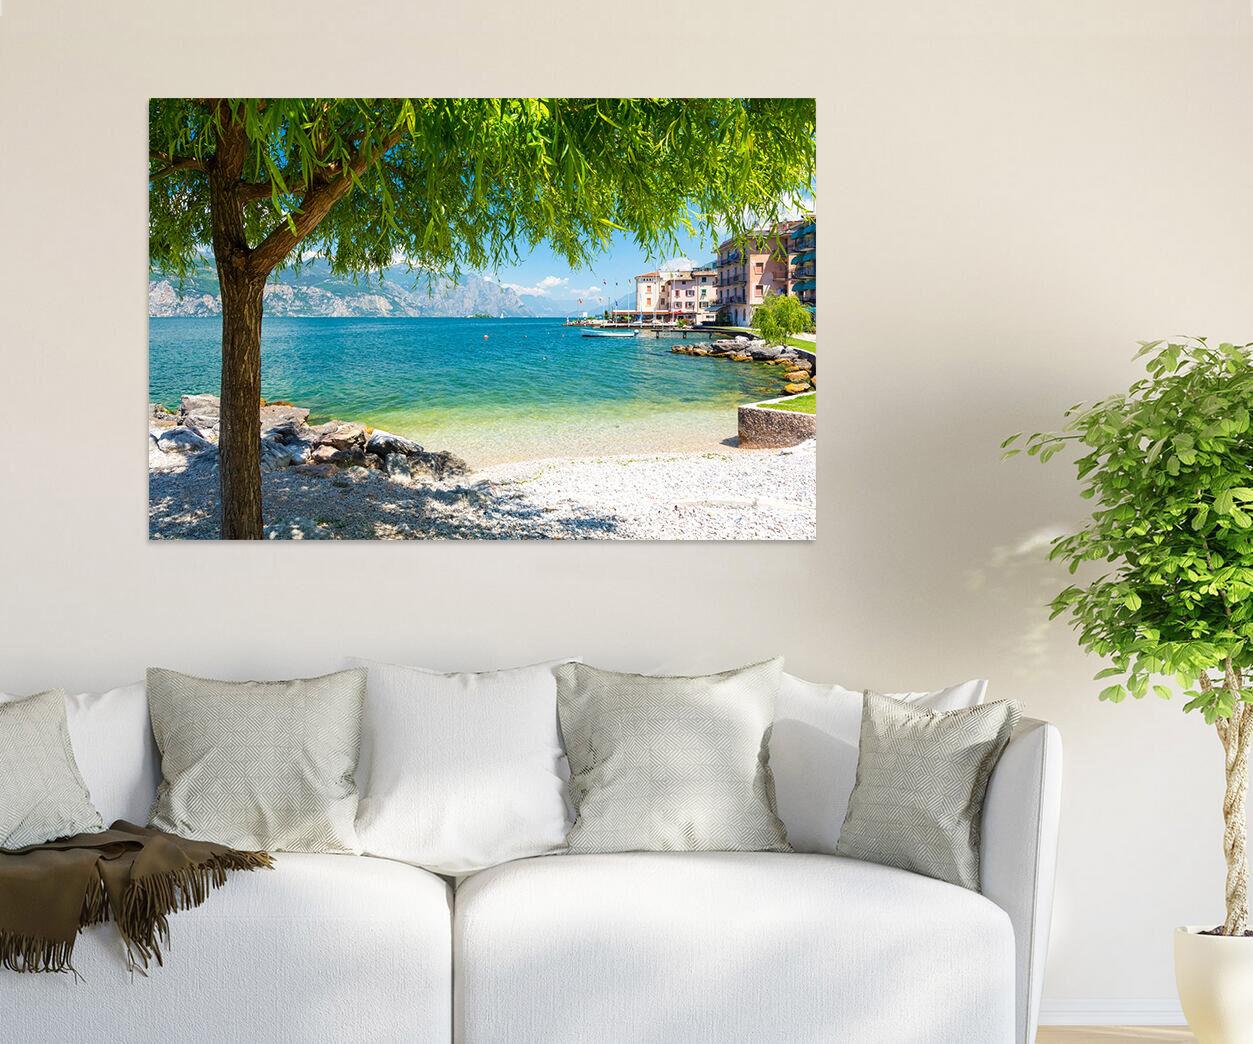 3D Sea Baum, Strand 33 Fototapeten Wandbild BildTapete Familie AJSTORE DE